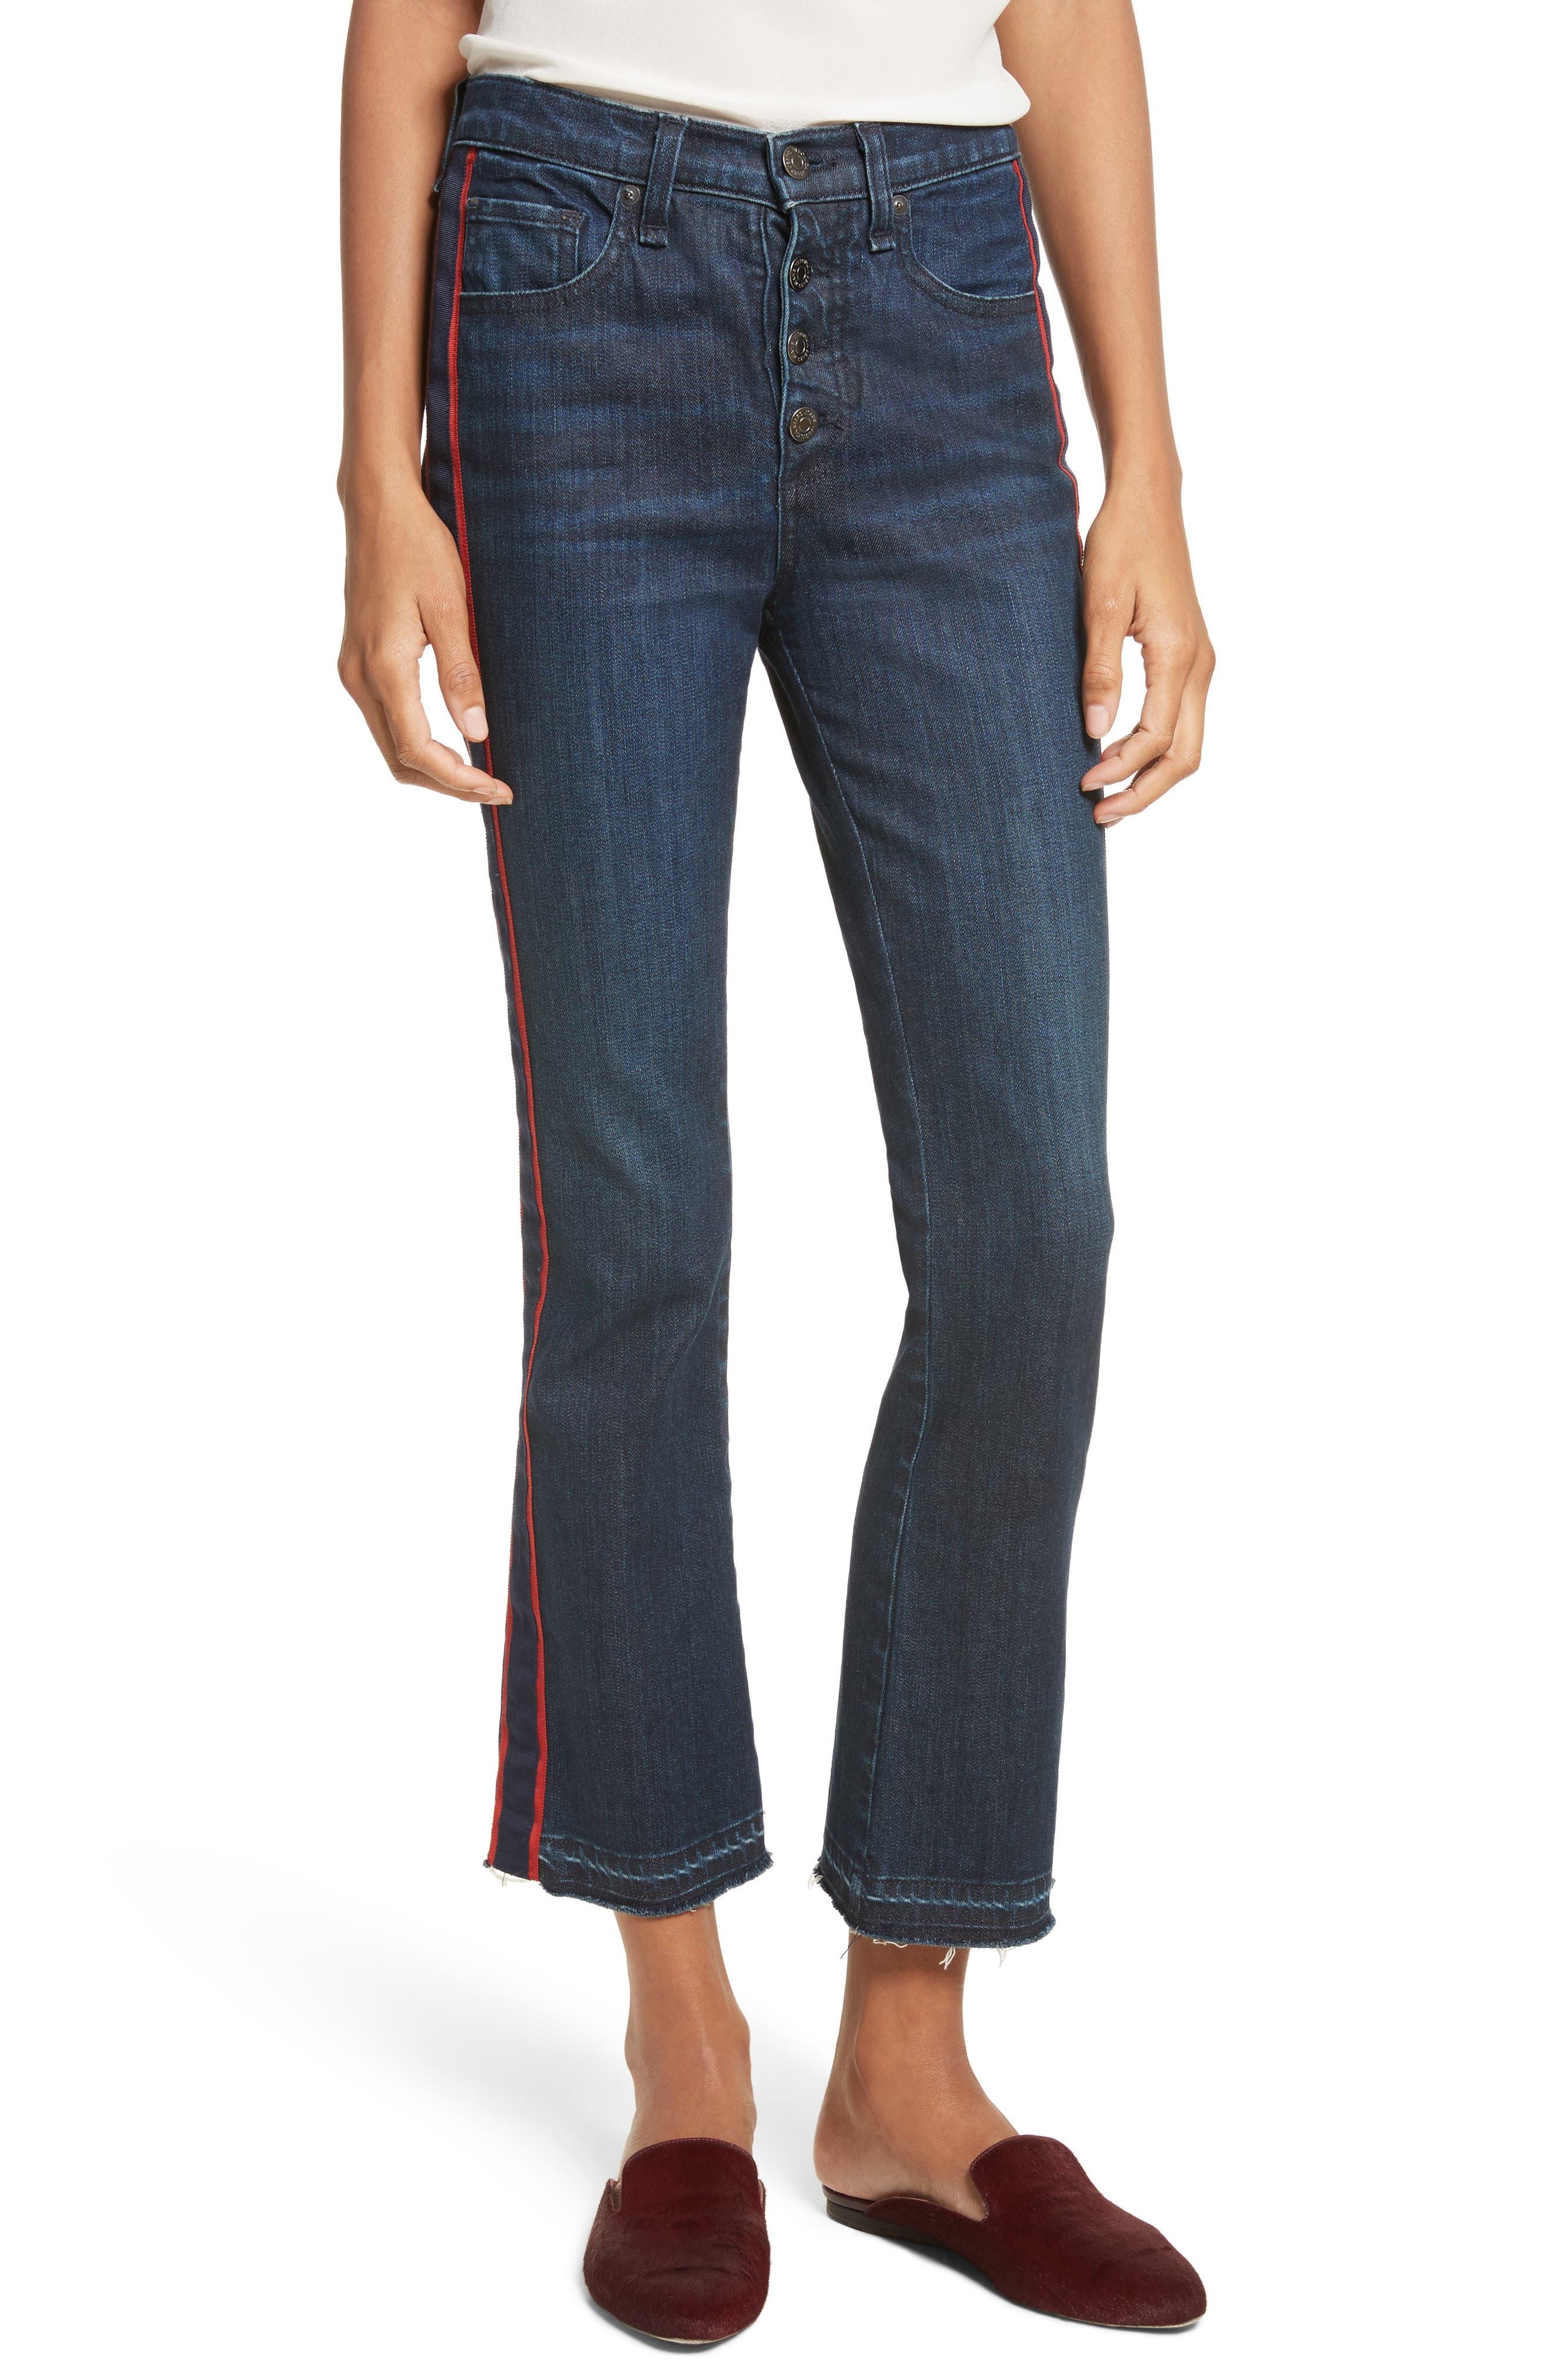 Main Image - Veronica Beard Carolyn Tuxedo Stripe Baby Boot Crop Jeans